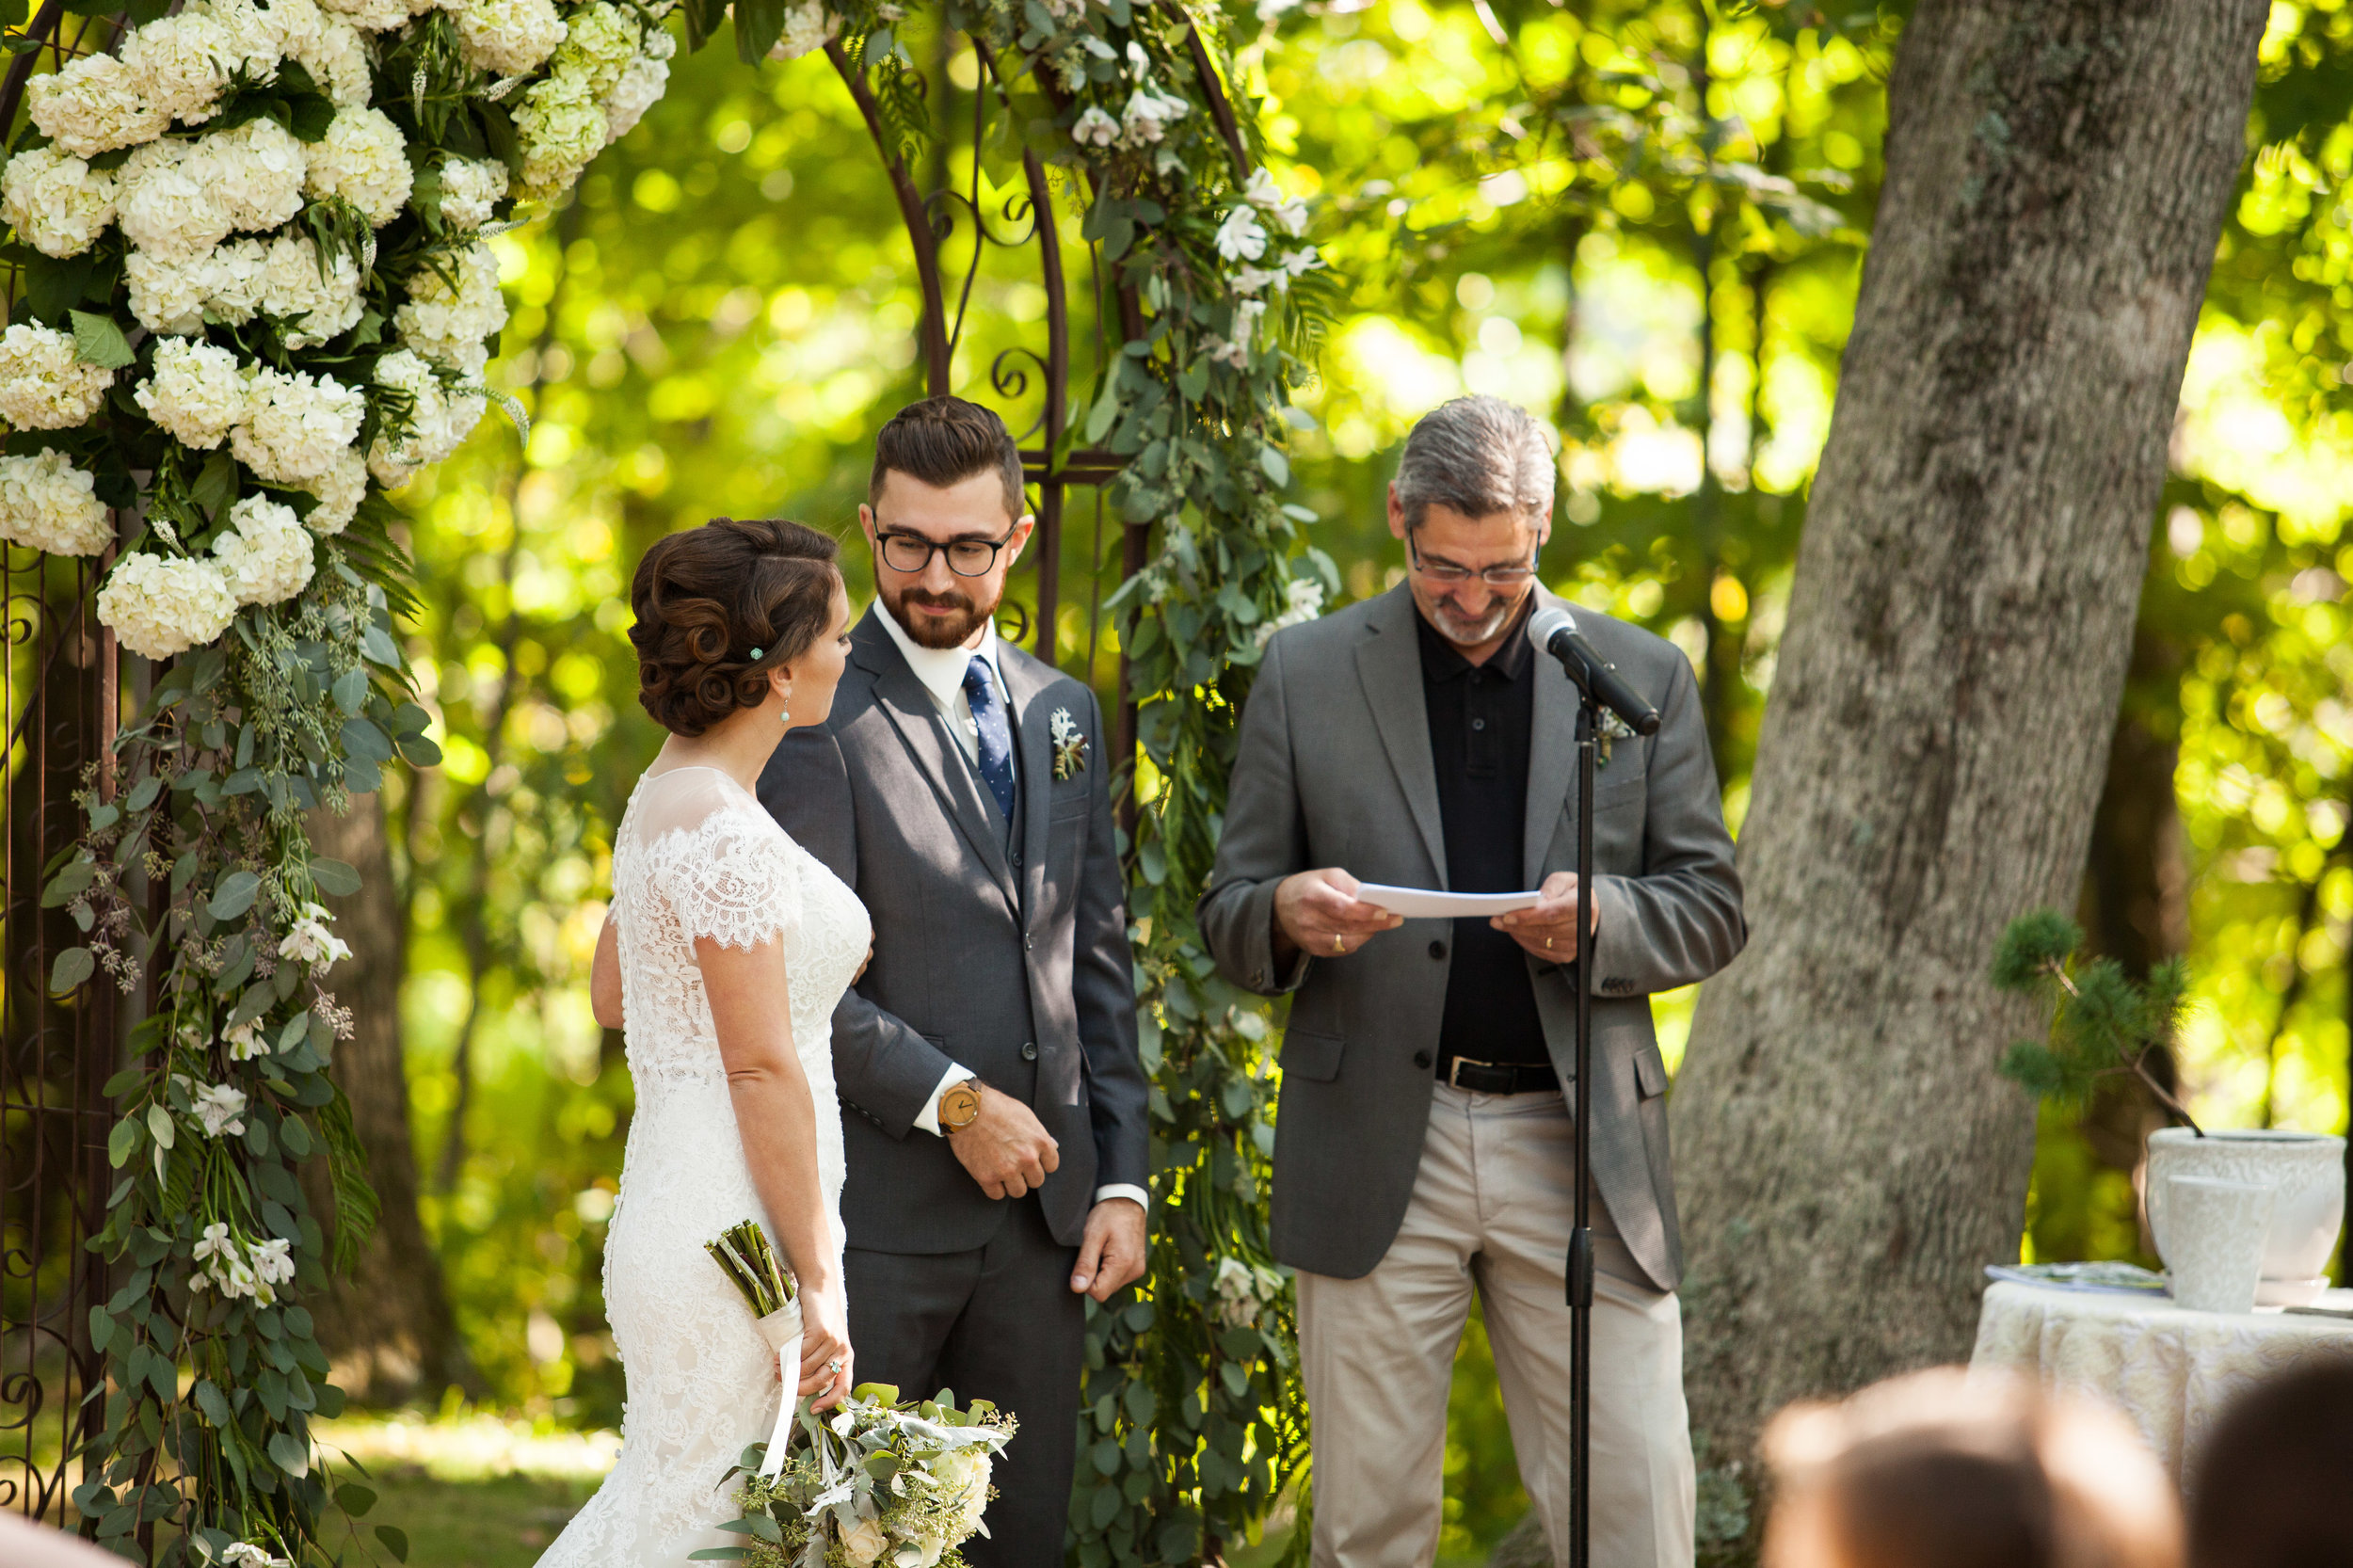 grand_rapids_wedding_rockford_wedding_richard_app_gallery_wedding_grand_rapids_wedding_photographer_summer_wedding_wabasis_lake_park_wedding_rustic_wedding-46.jpg